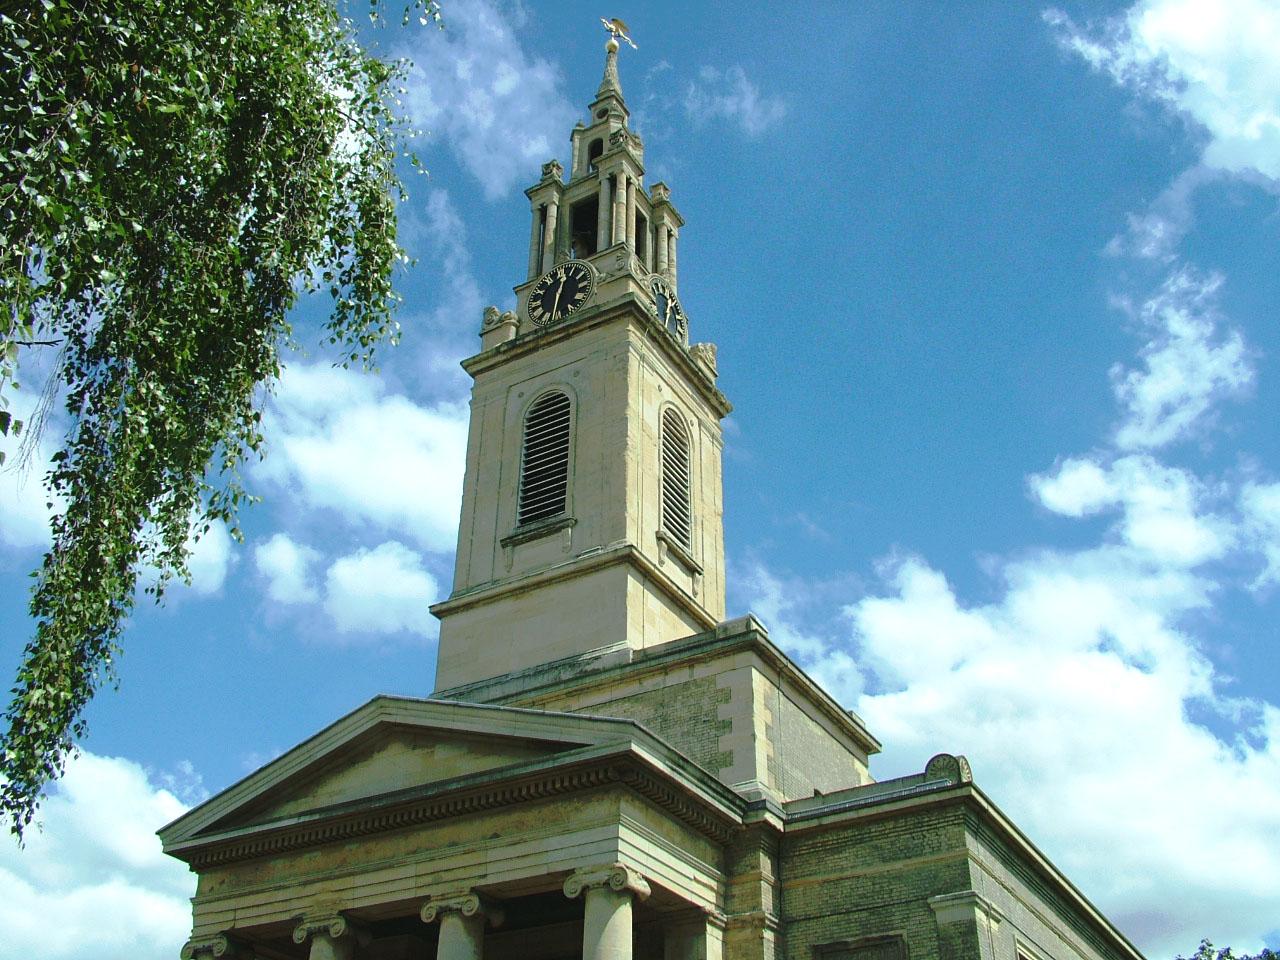 St James', Bermondsey